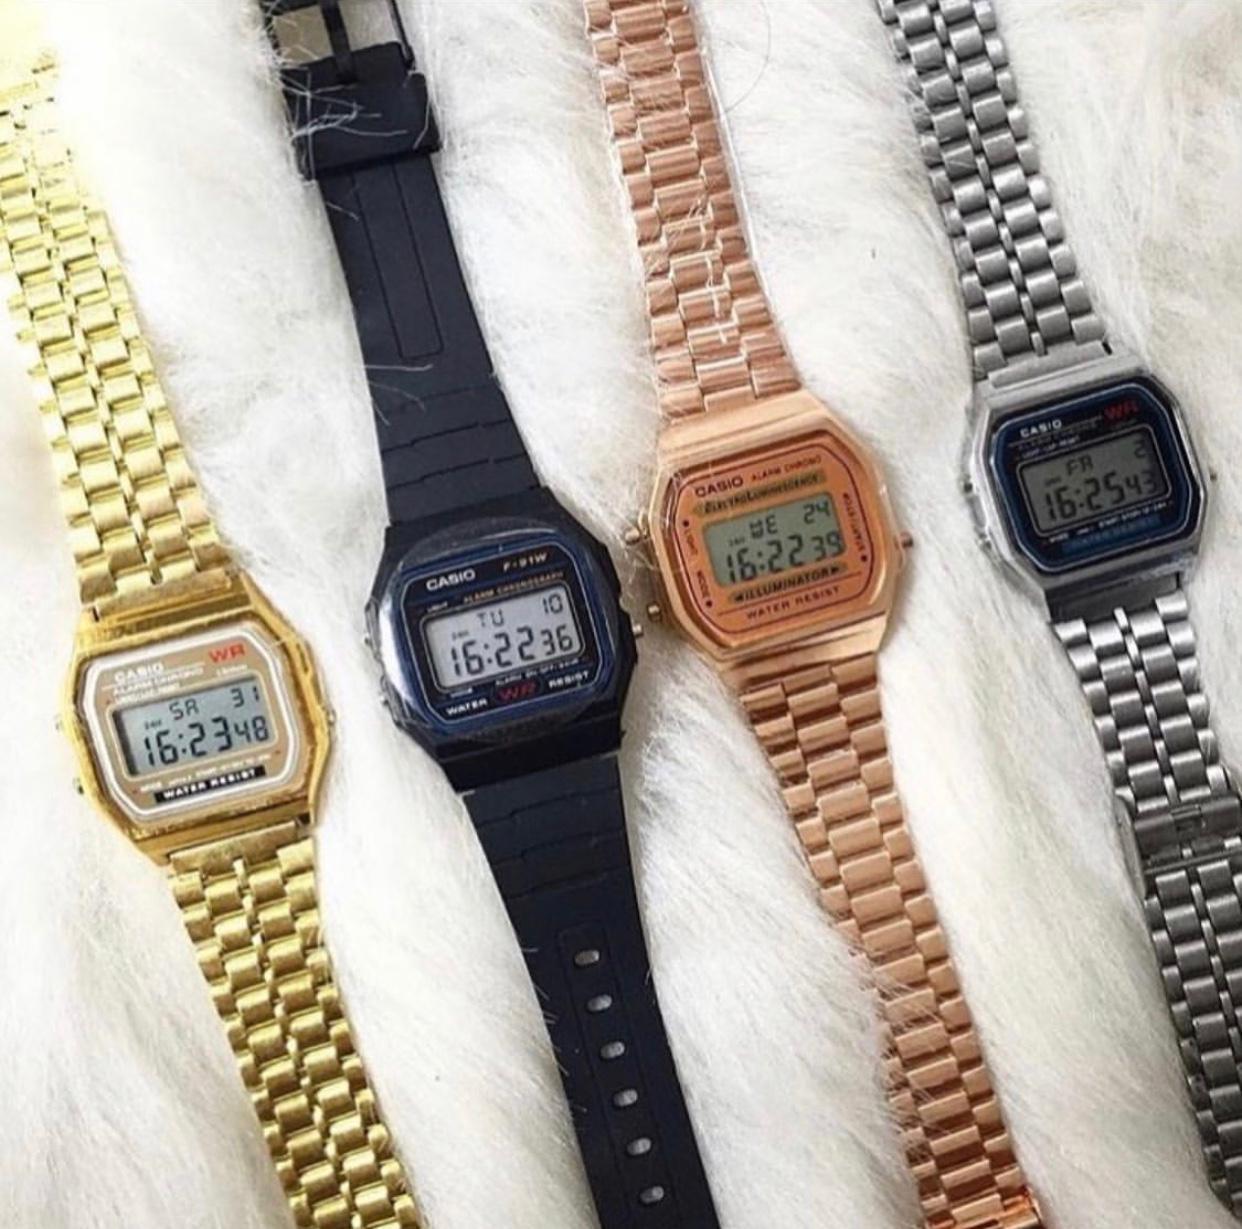 Relógio Casio vintage (Tradicional)